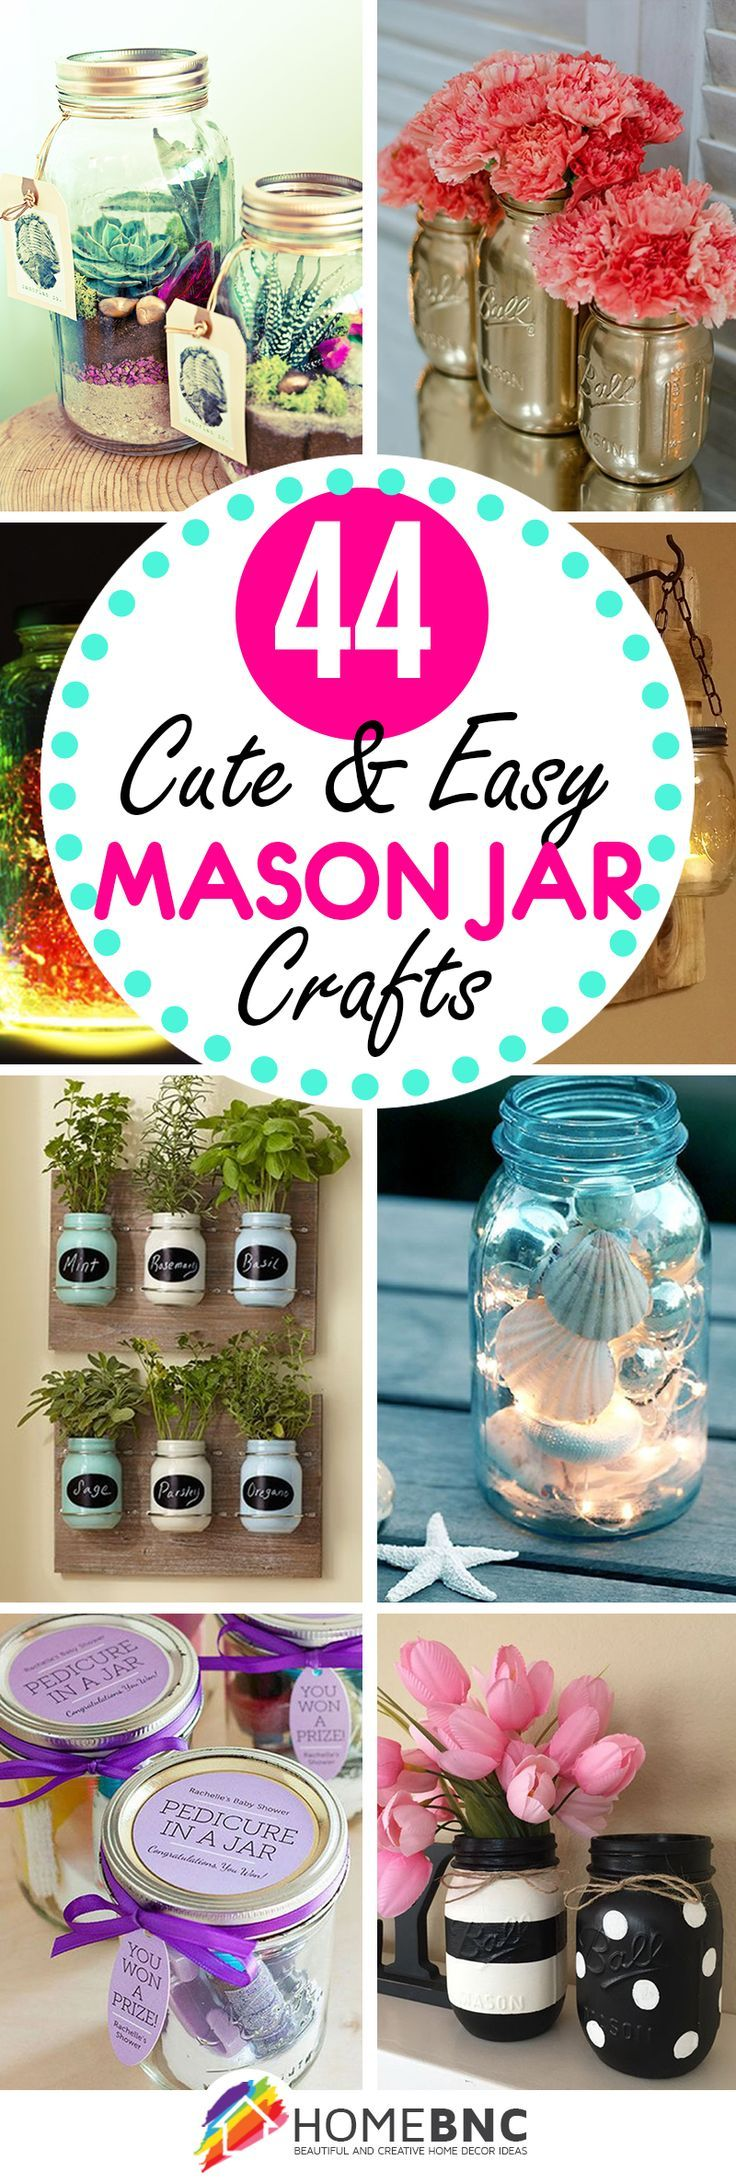 Get Creative with these 44 DIY Mason Jar Crafts | Mason jar crafts ...